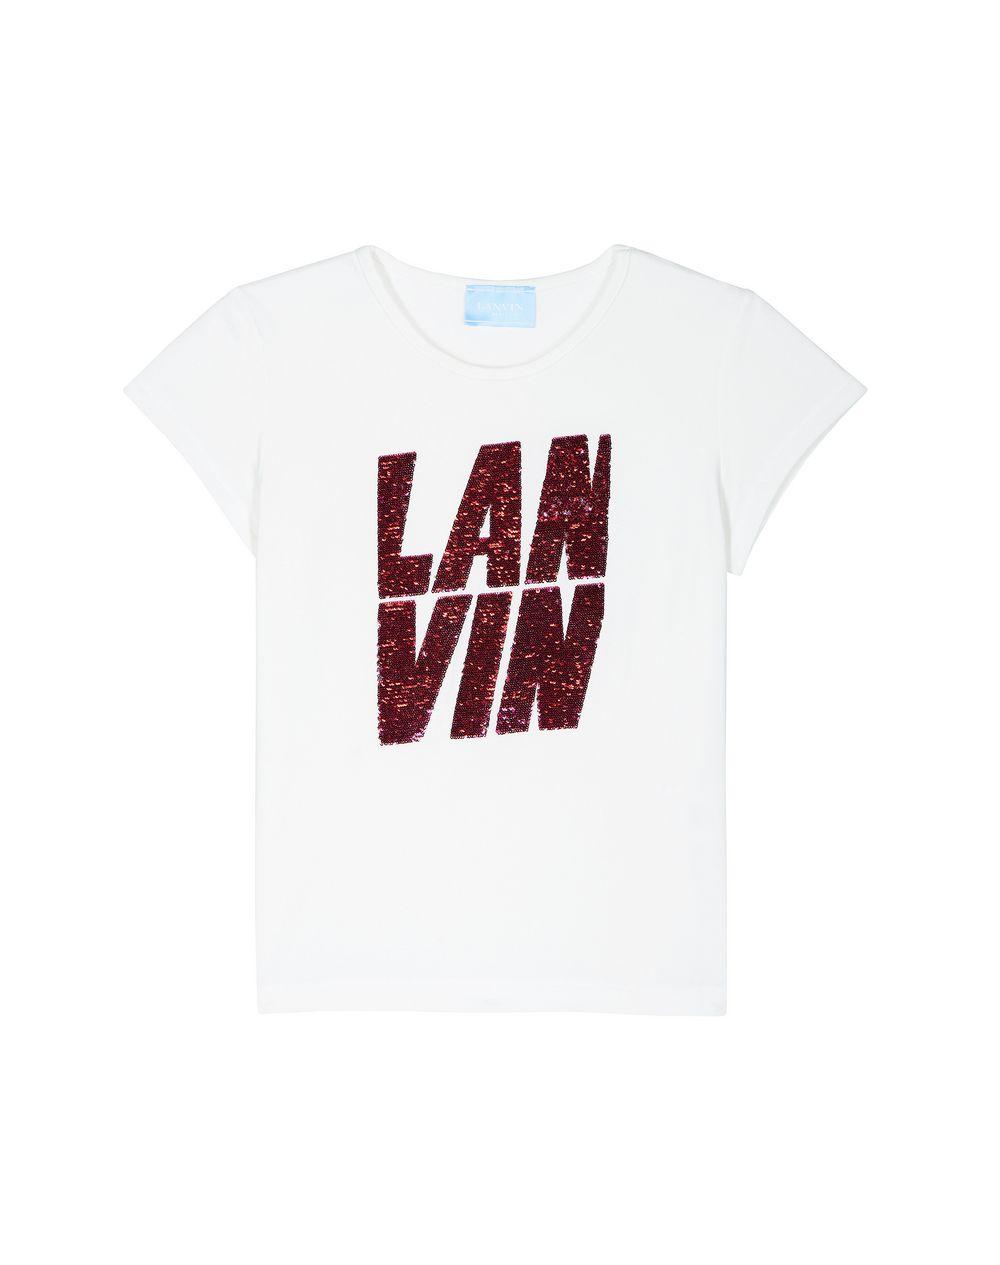 LANVIN LOGO T-SHIRT - Lanvin